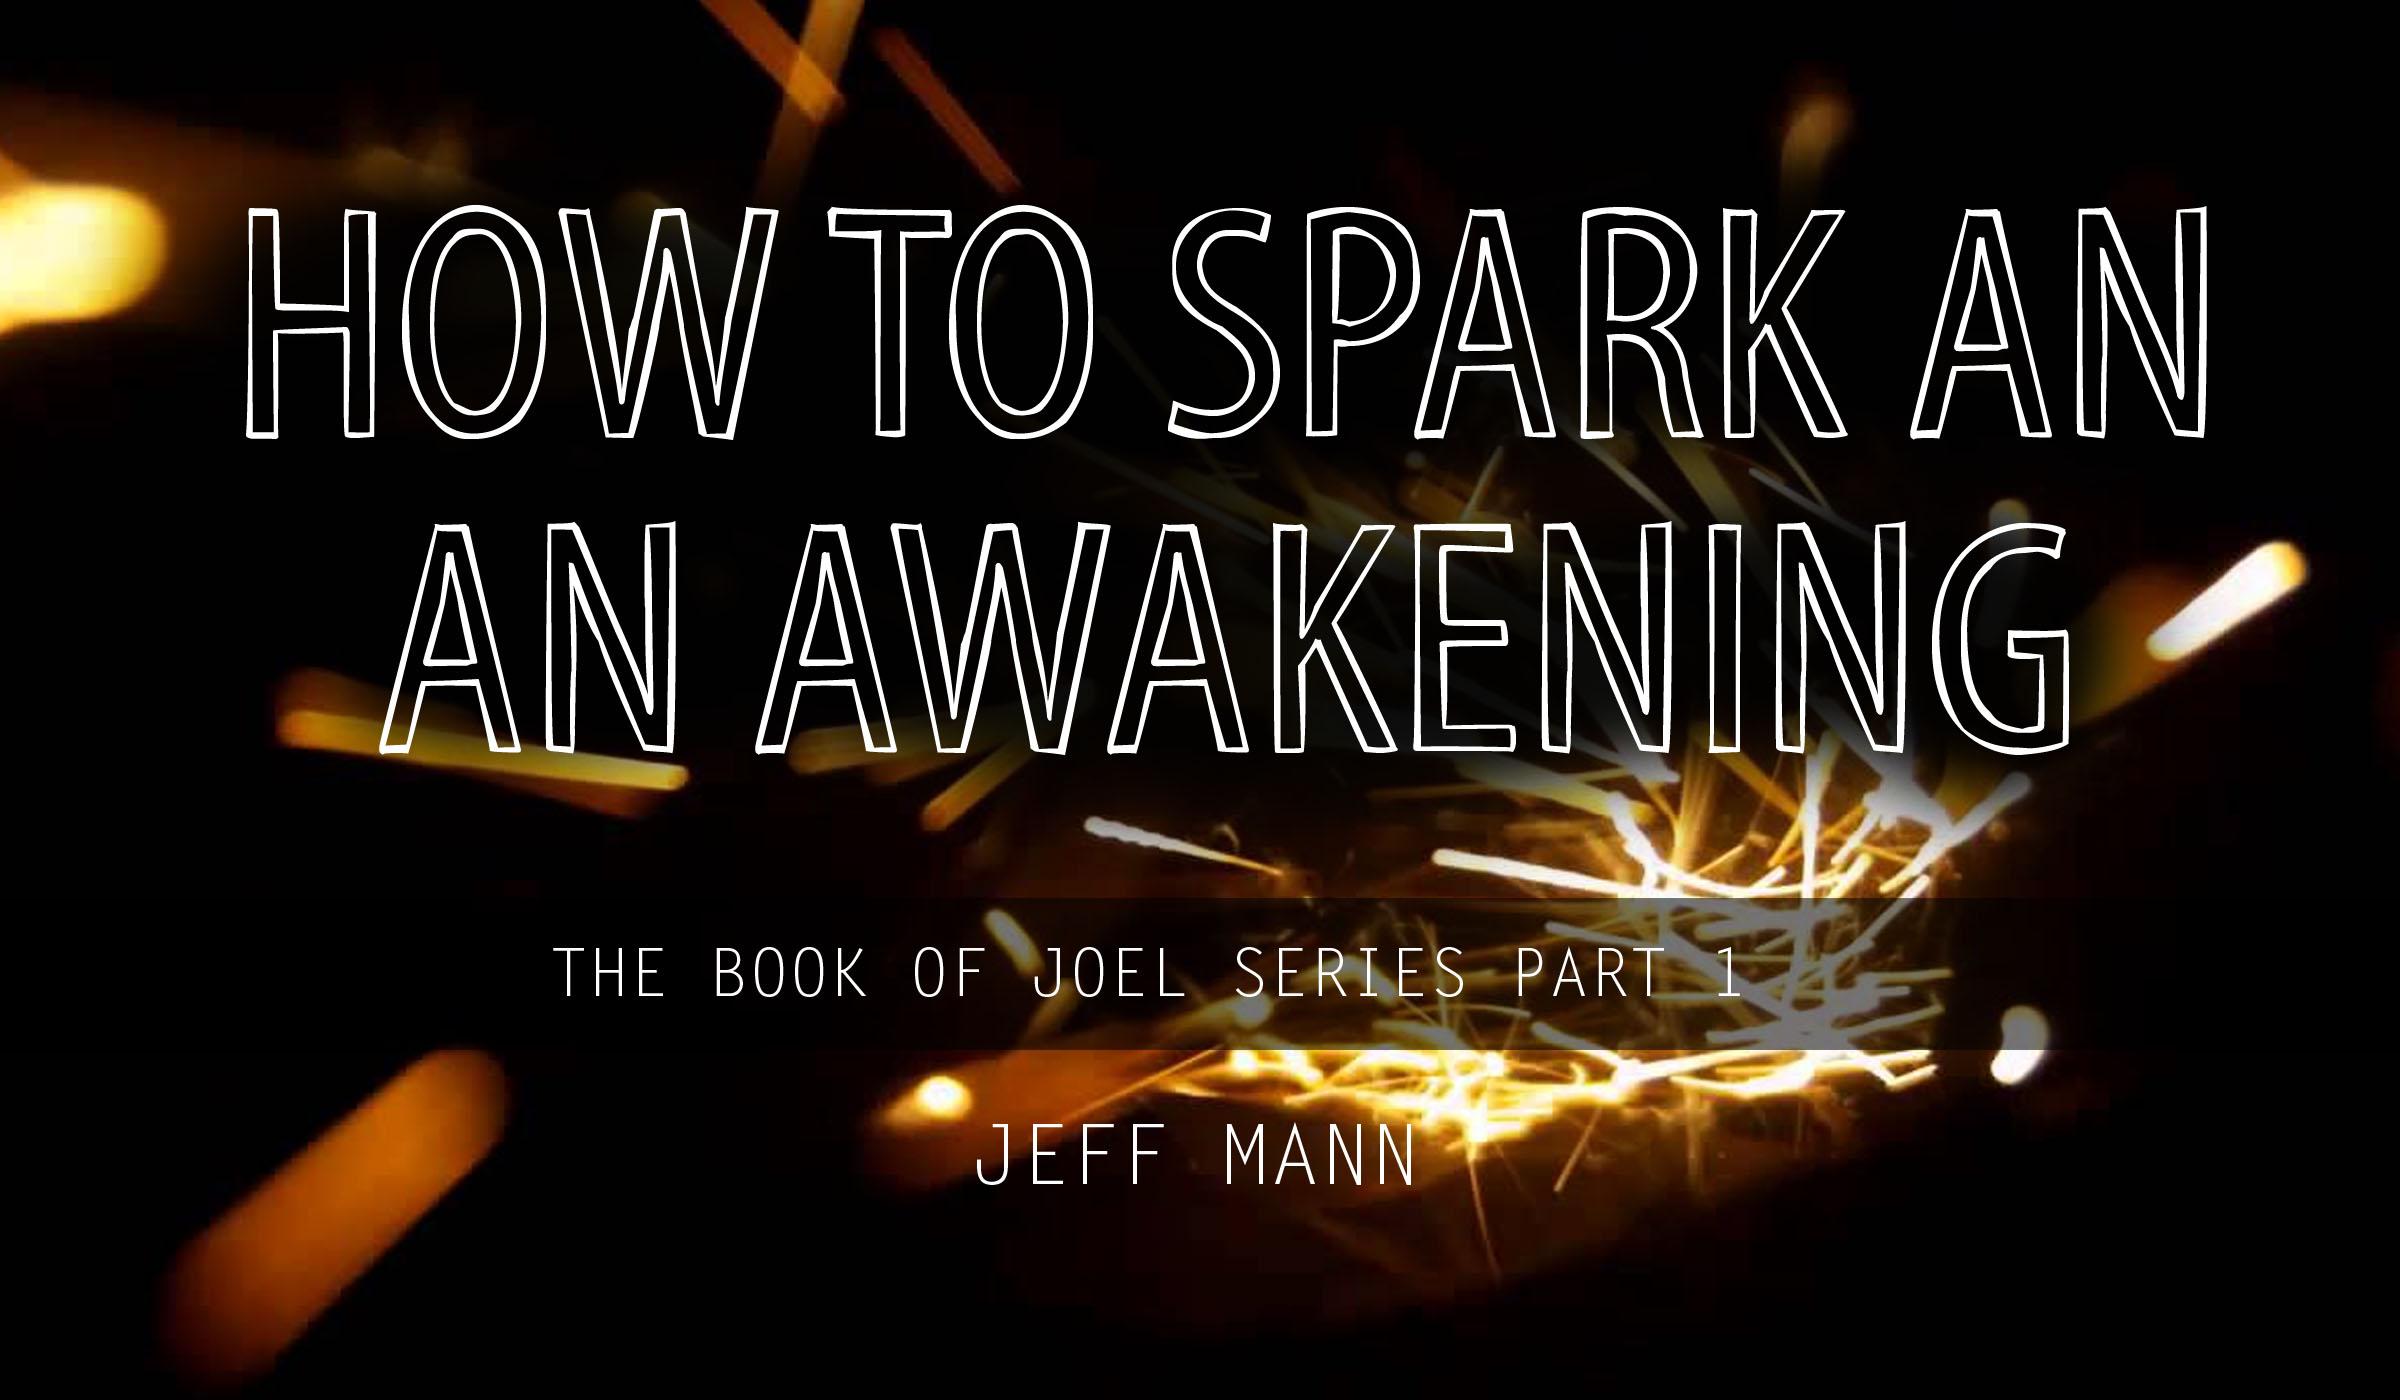 How to Spark an Awakening